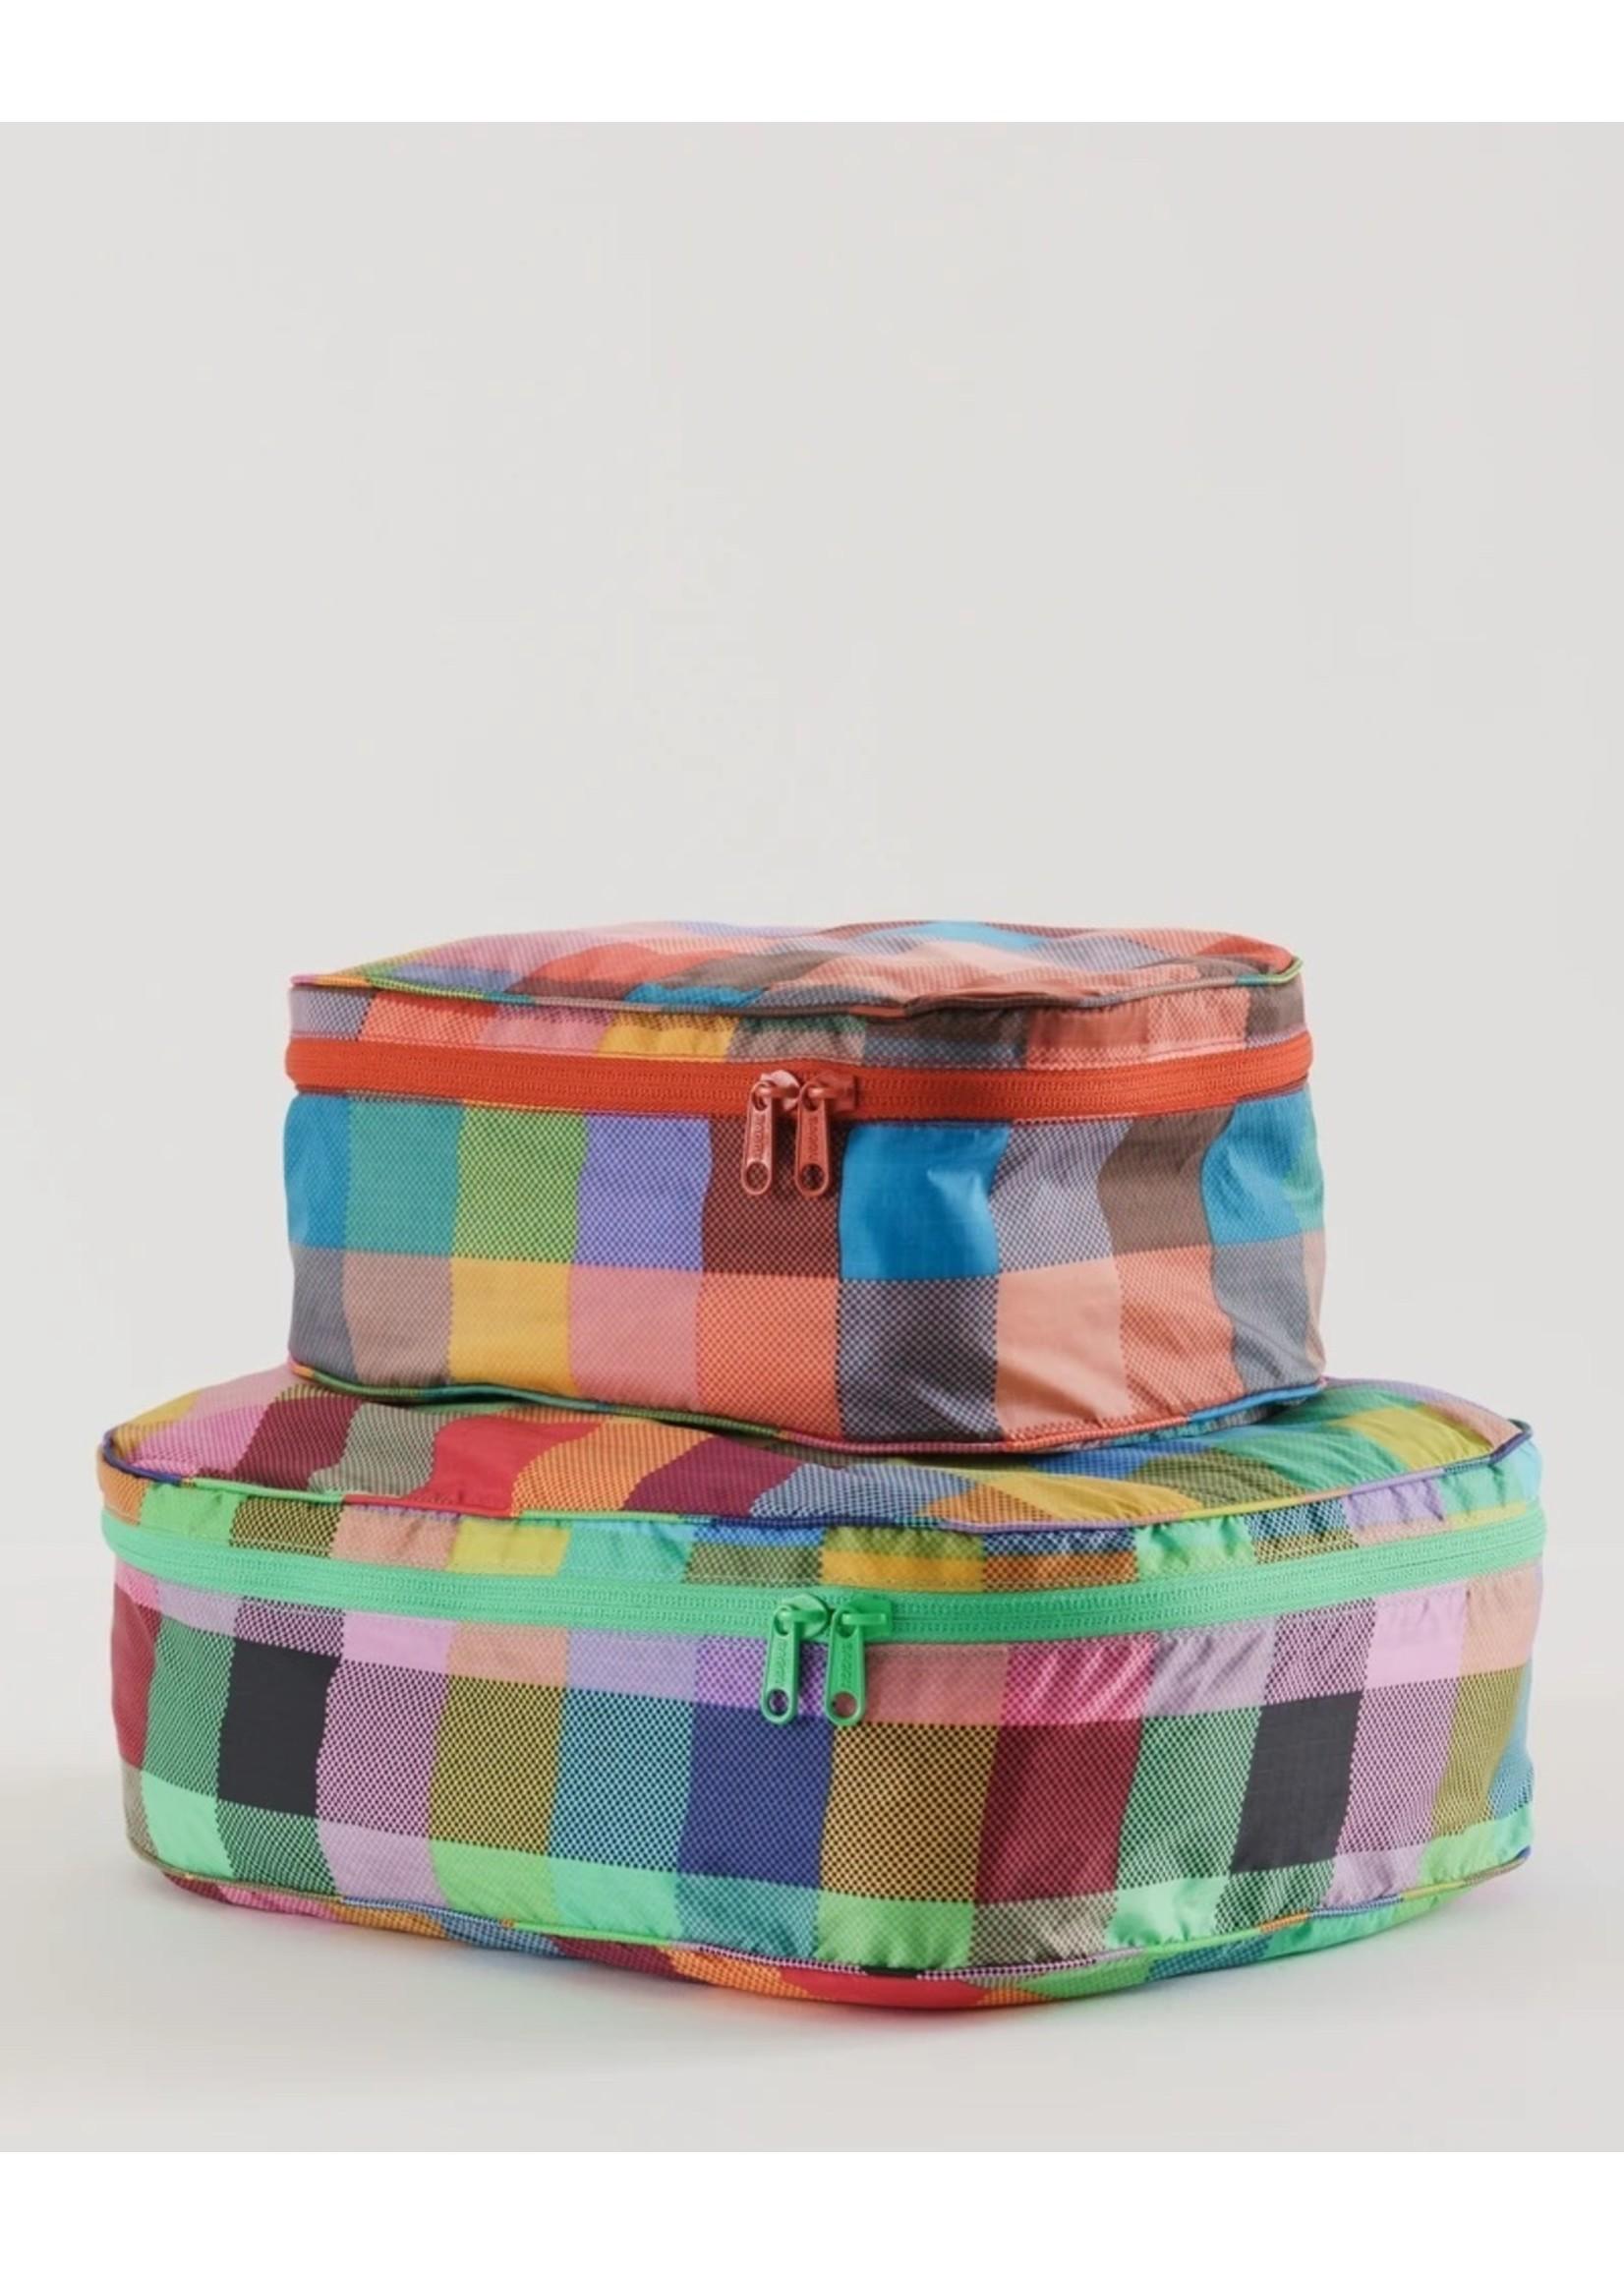 Baggu Baggu Storage Cube Set - Madras Mix